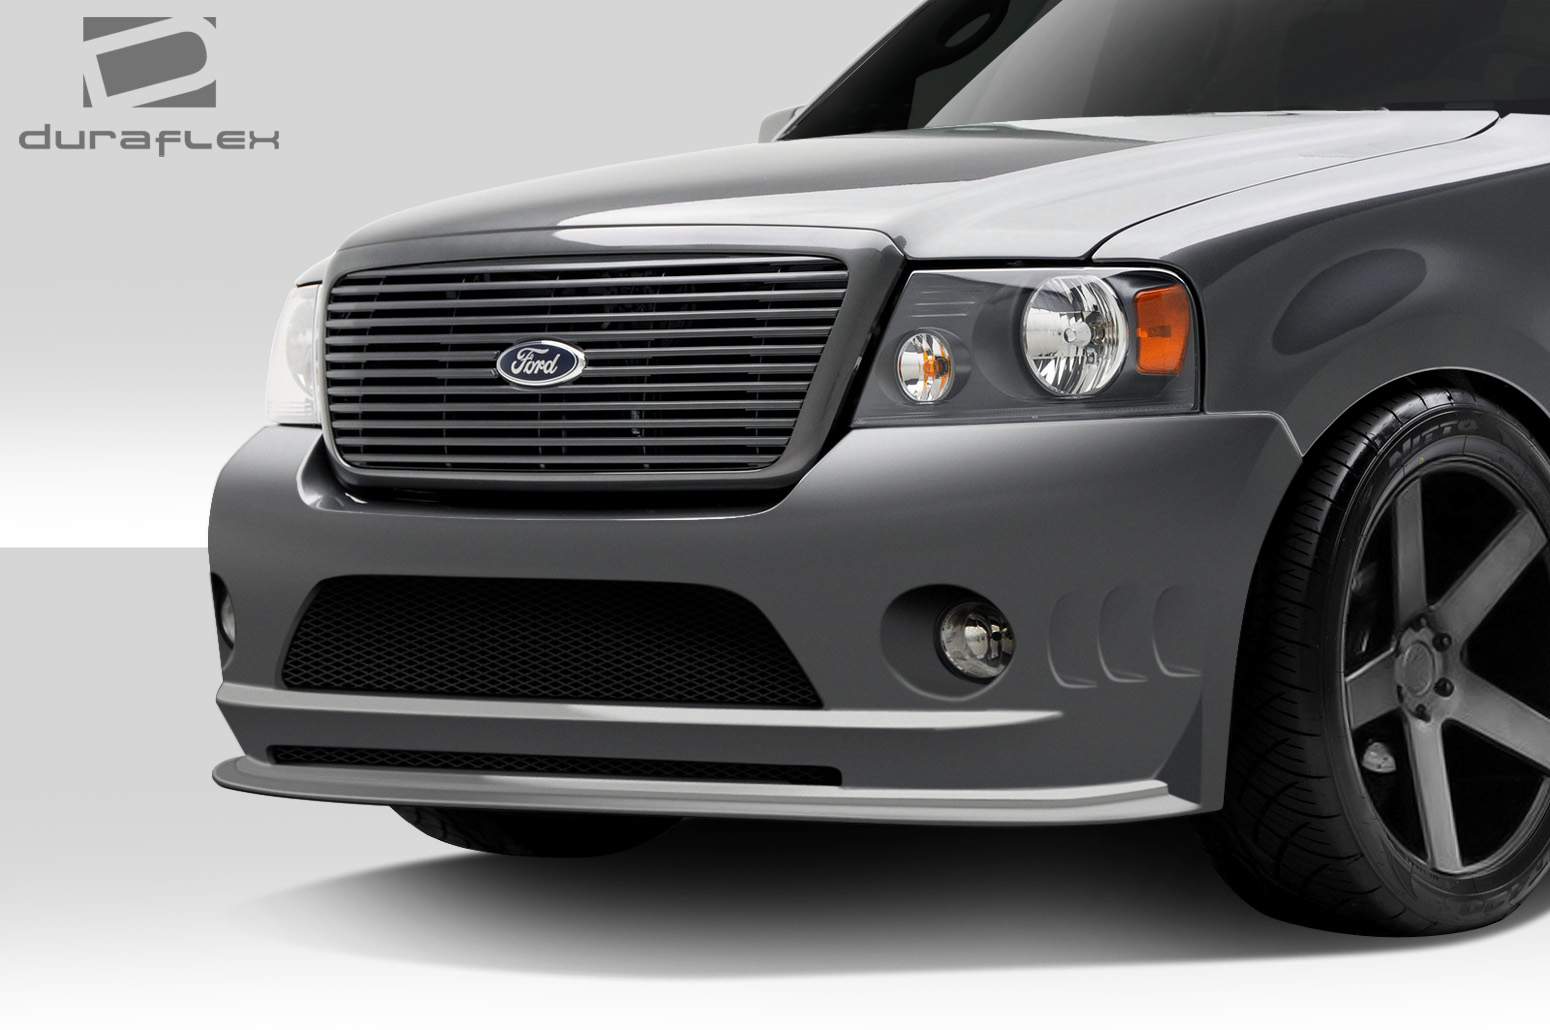 04 08 ford f150 bt 2 duraflex front body kit bumper 109915 ebay. Black Bedroom Furniture Sets. Home Design Ideas